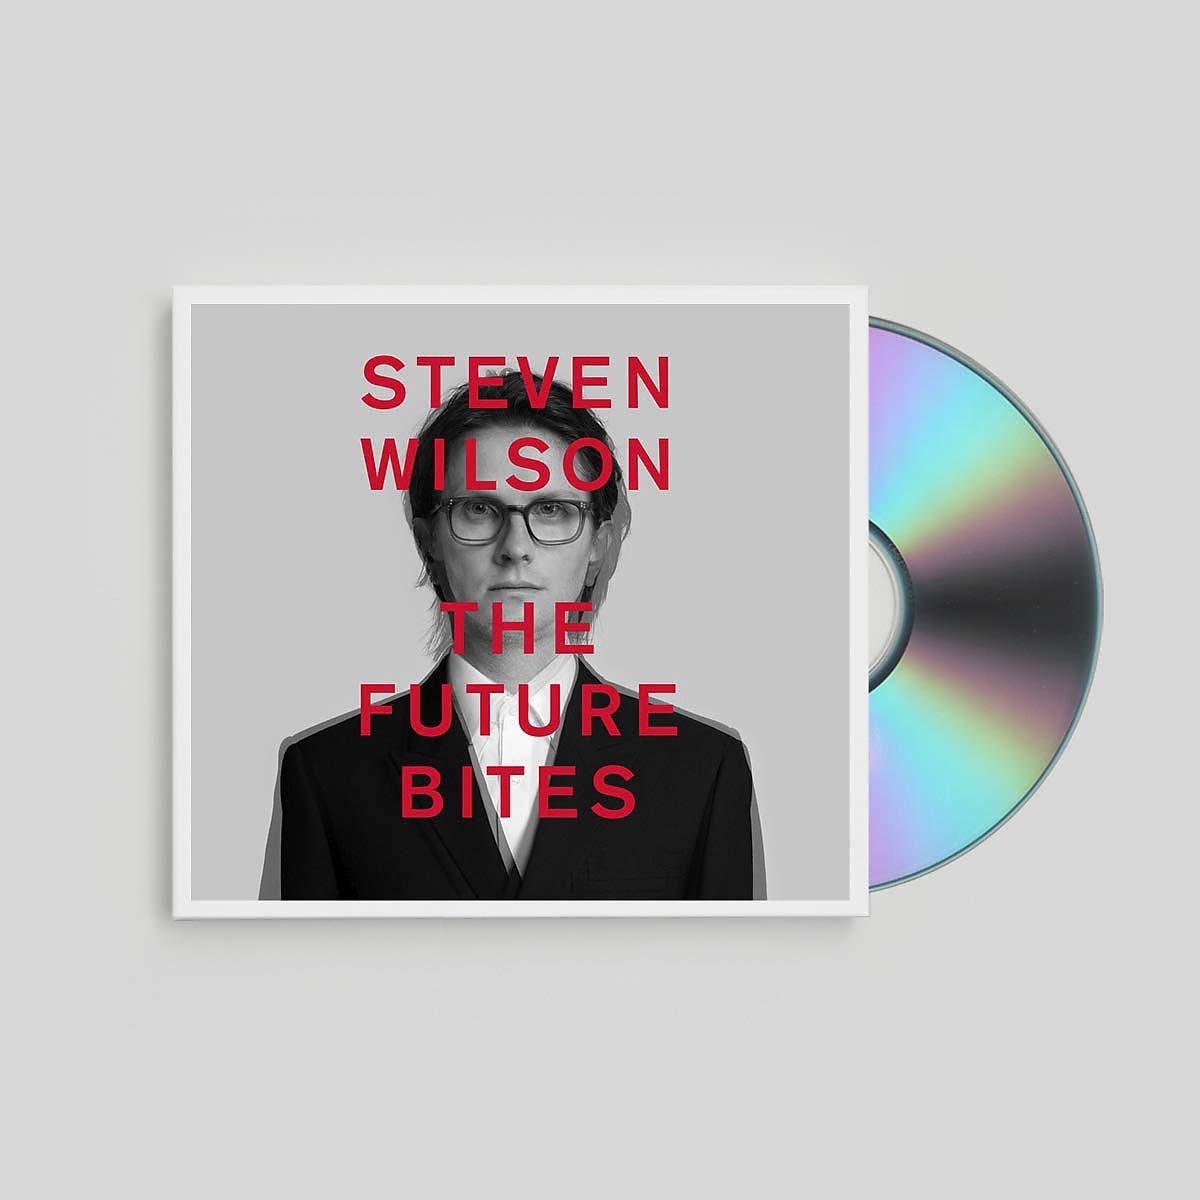 Steven Wilson - The Future Bites (2021) [FLAC] Download